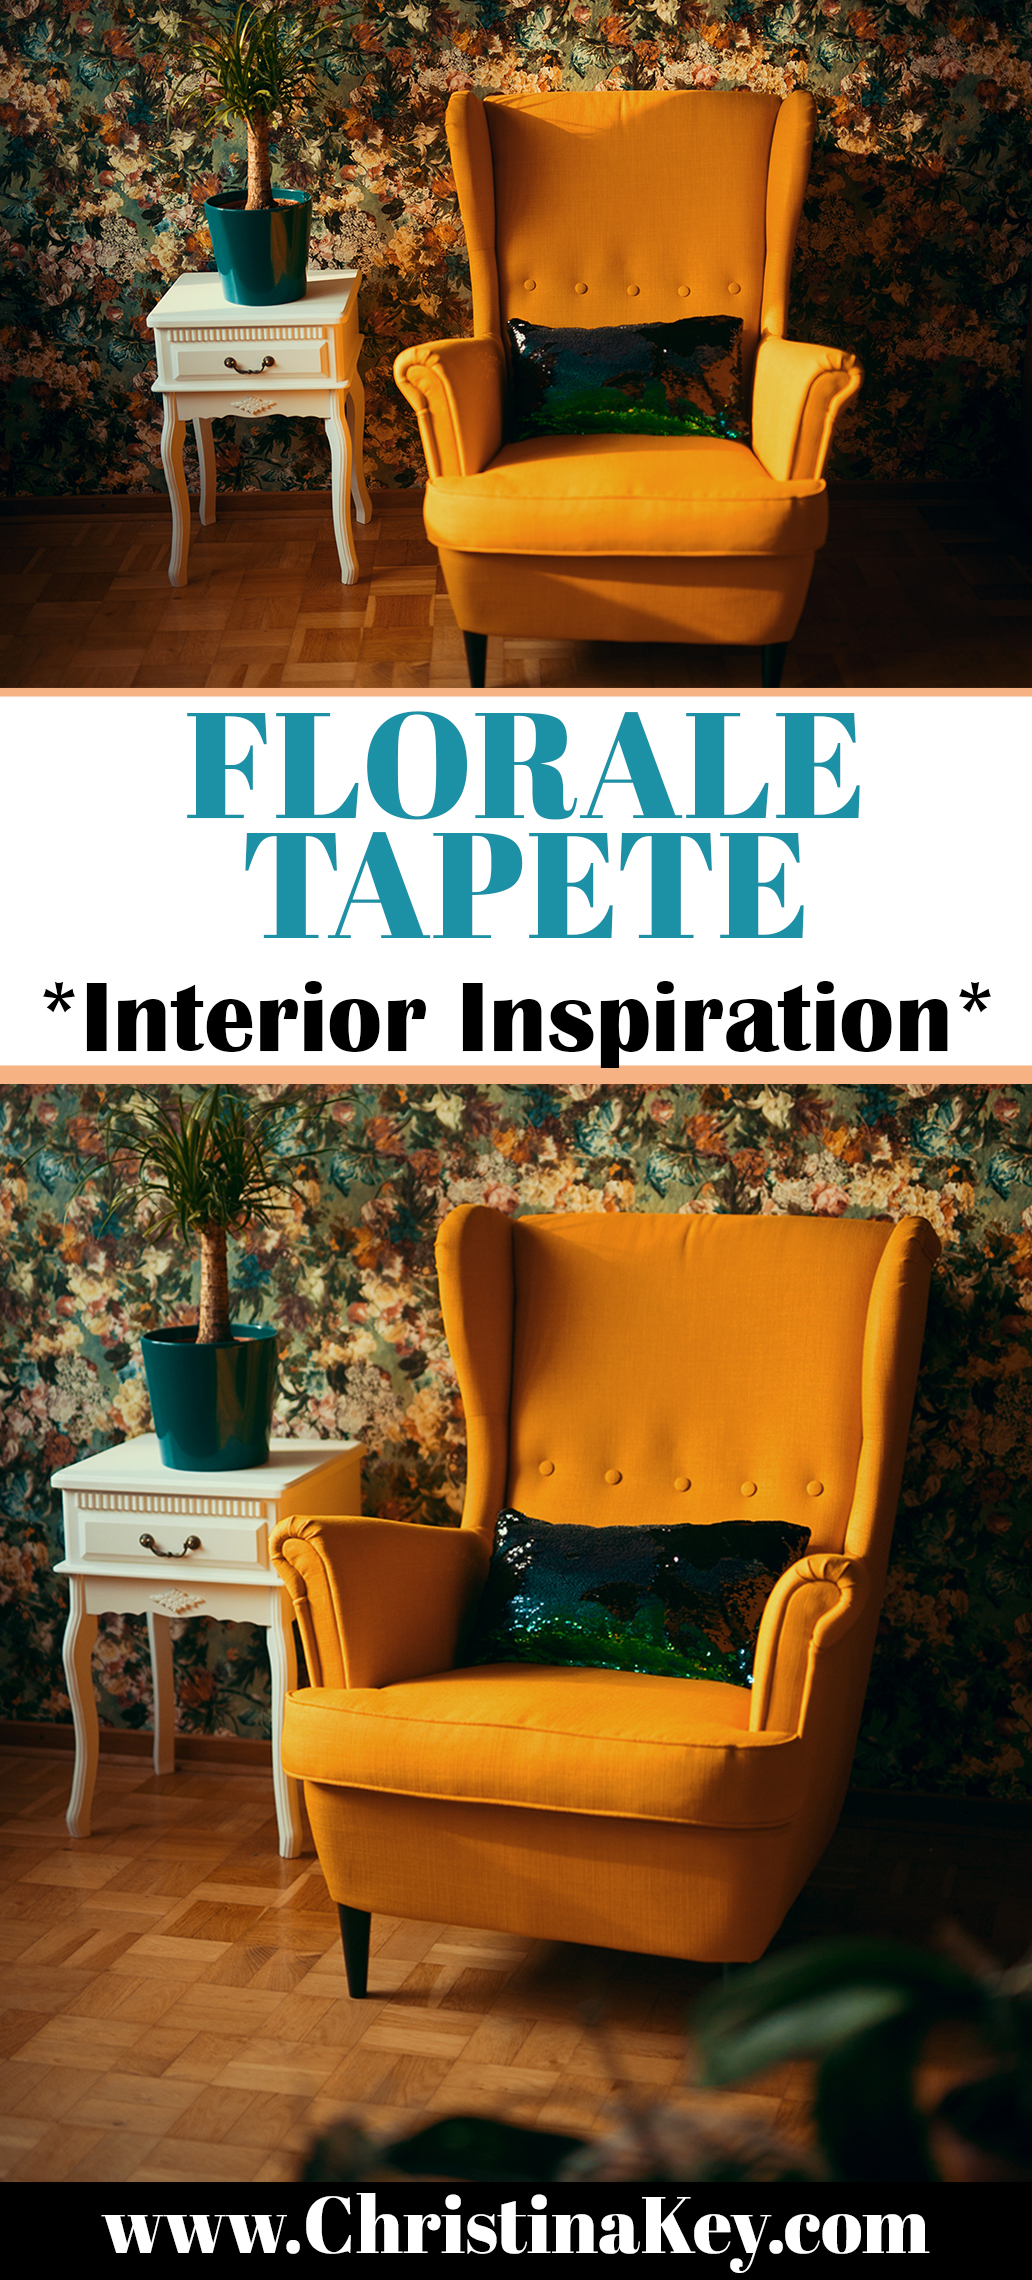 Florale Tapete Interior Inspiration